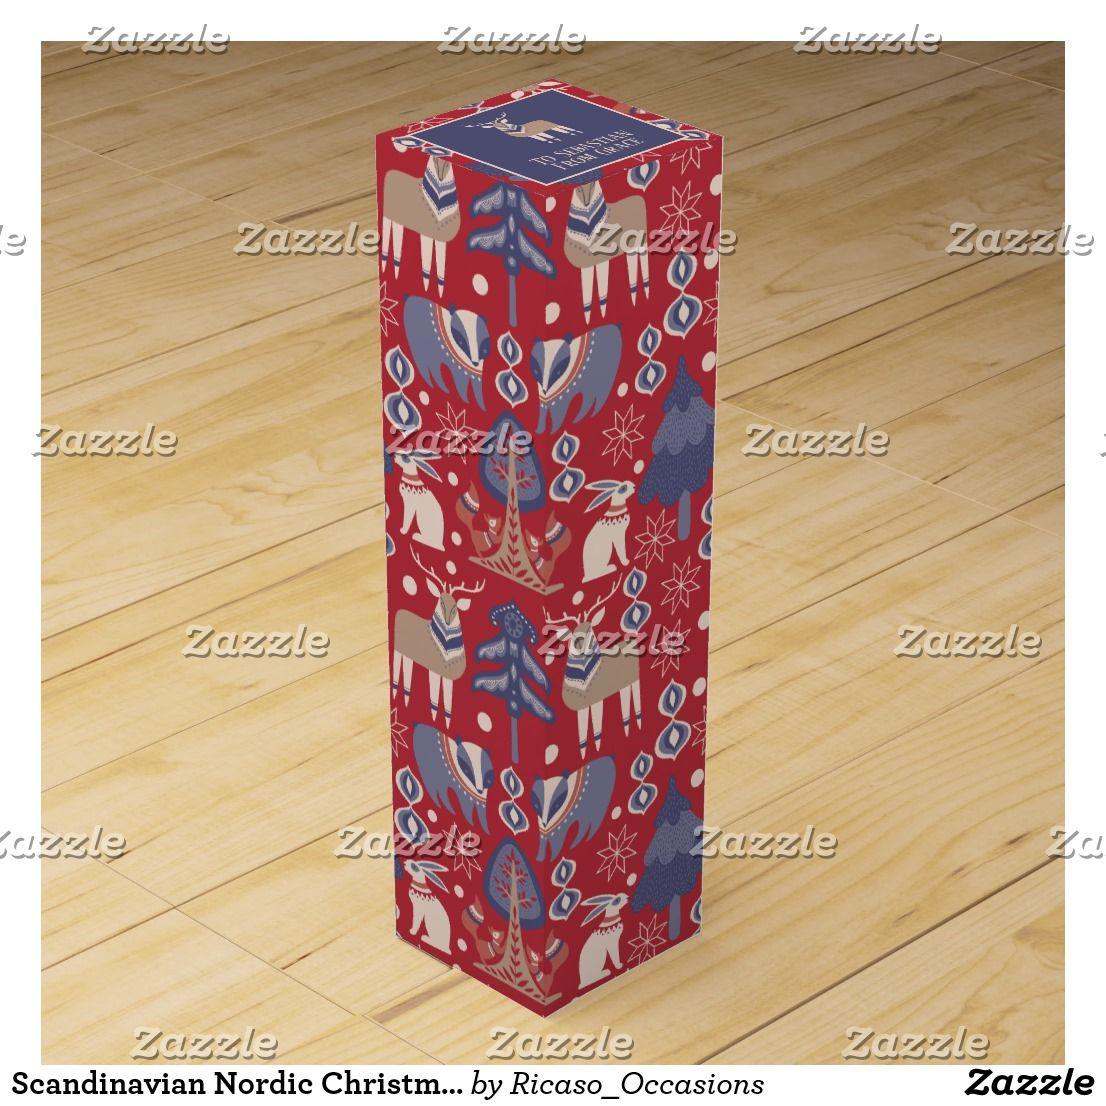 Scandinavian Nordic Christmas Personalized Wine Box Zazzle Com Personalized Wine Box Custom Wine Box Personalized Wine